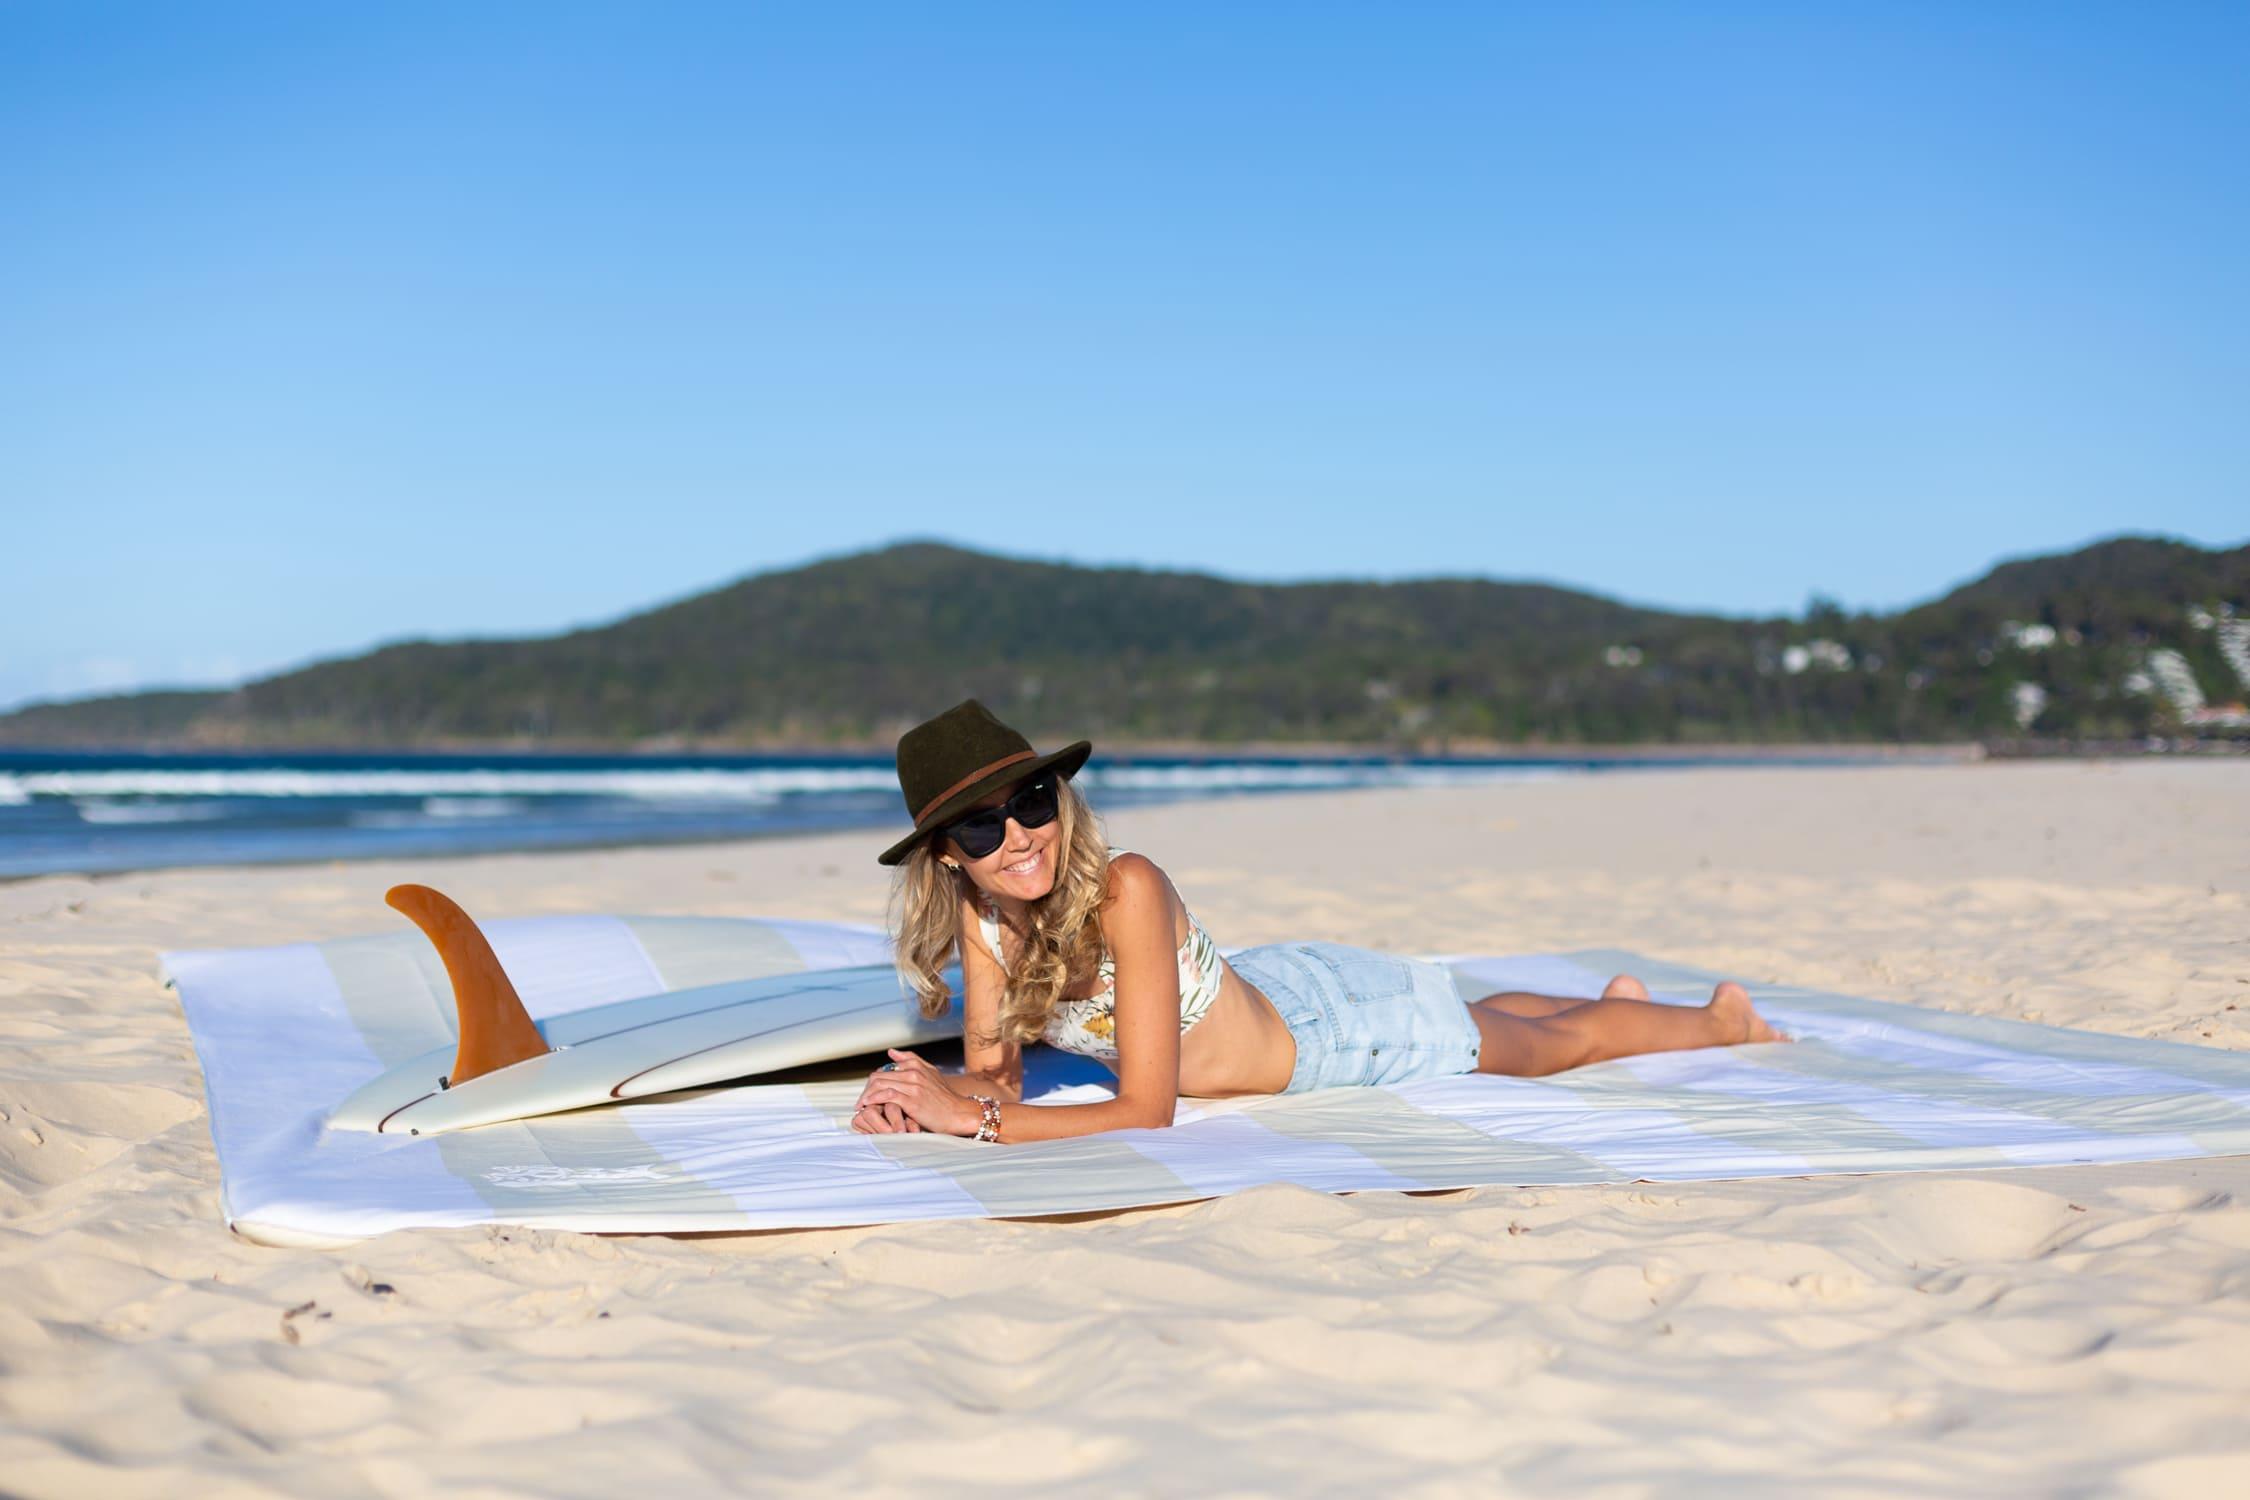 The Big Towel Whitsunday Sand Longboard Scene